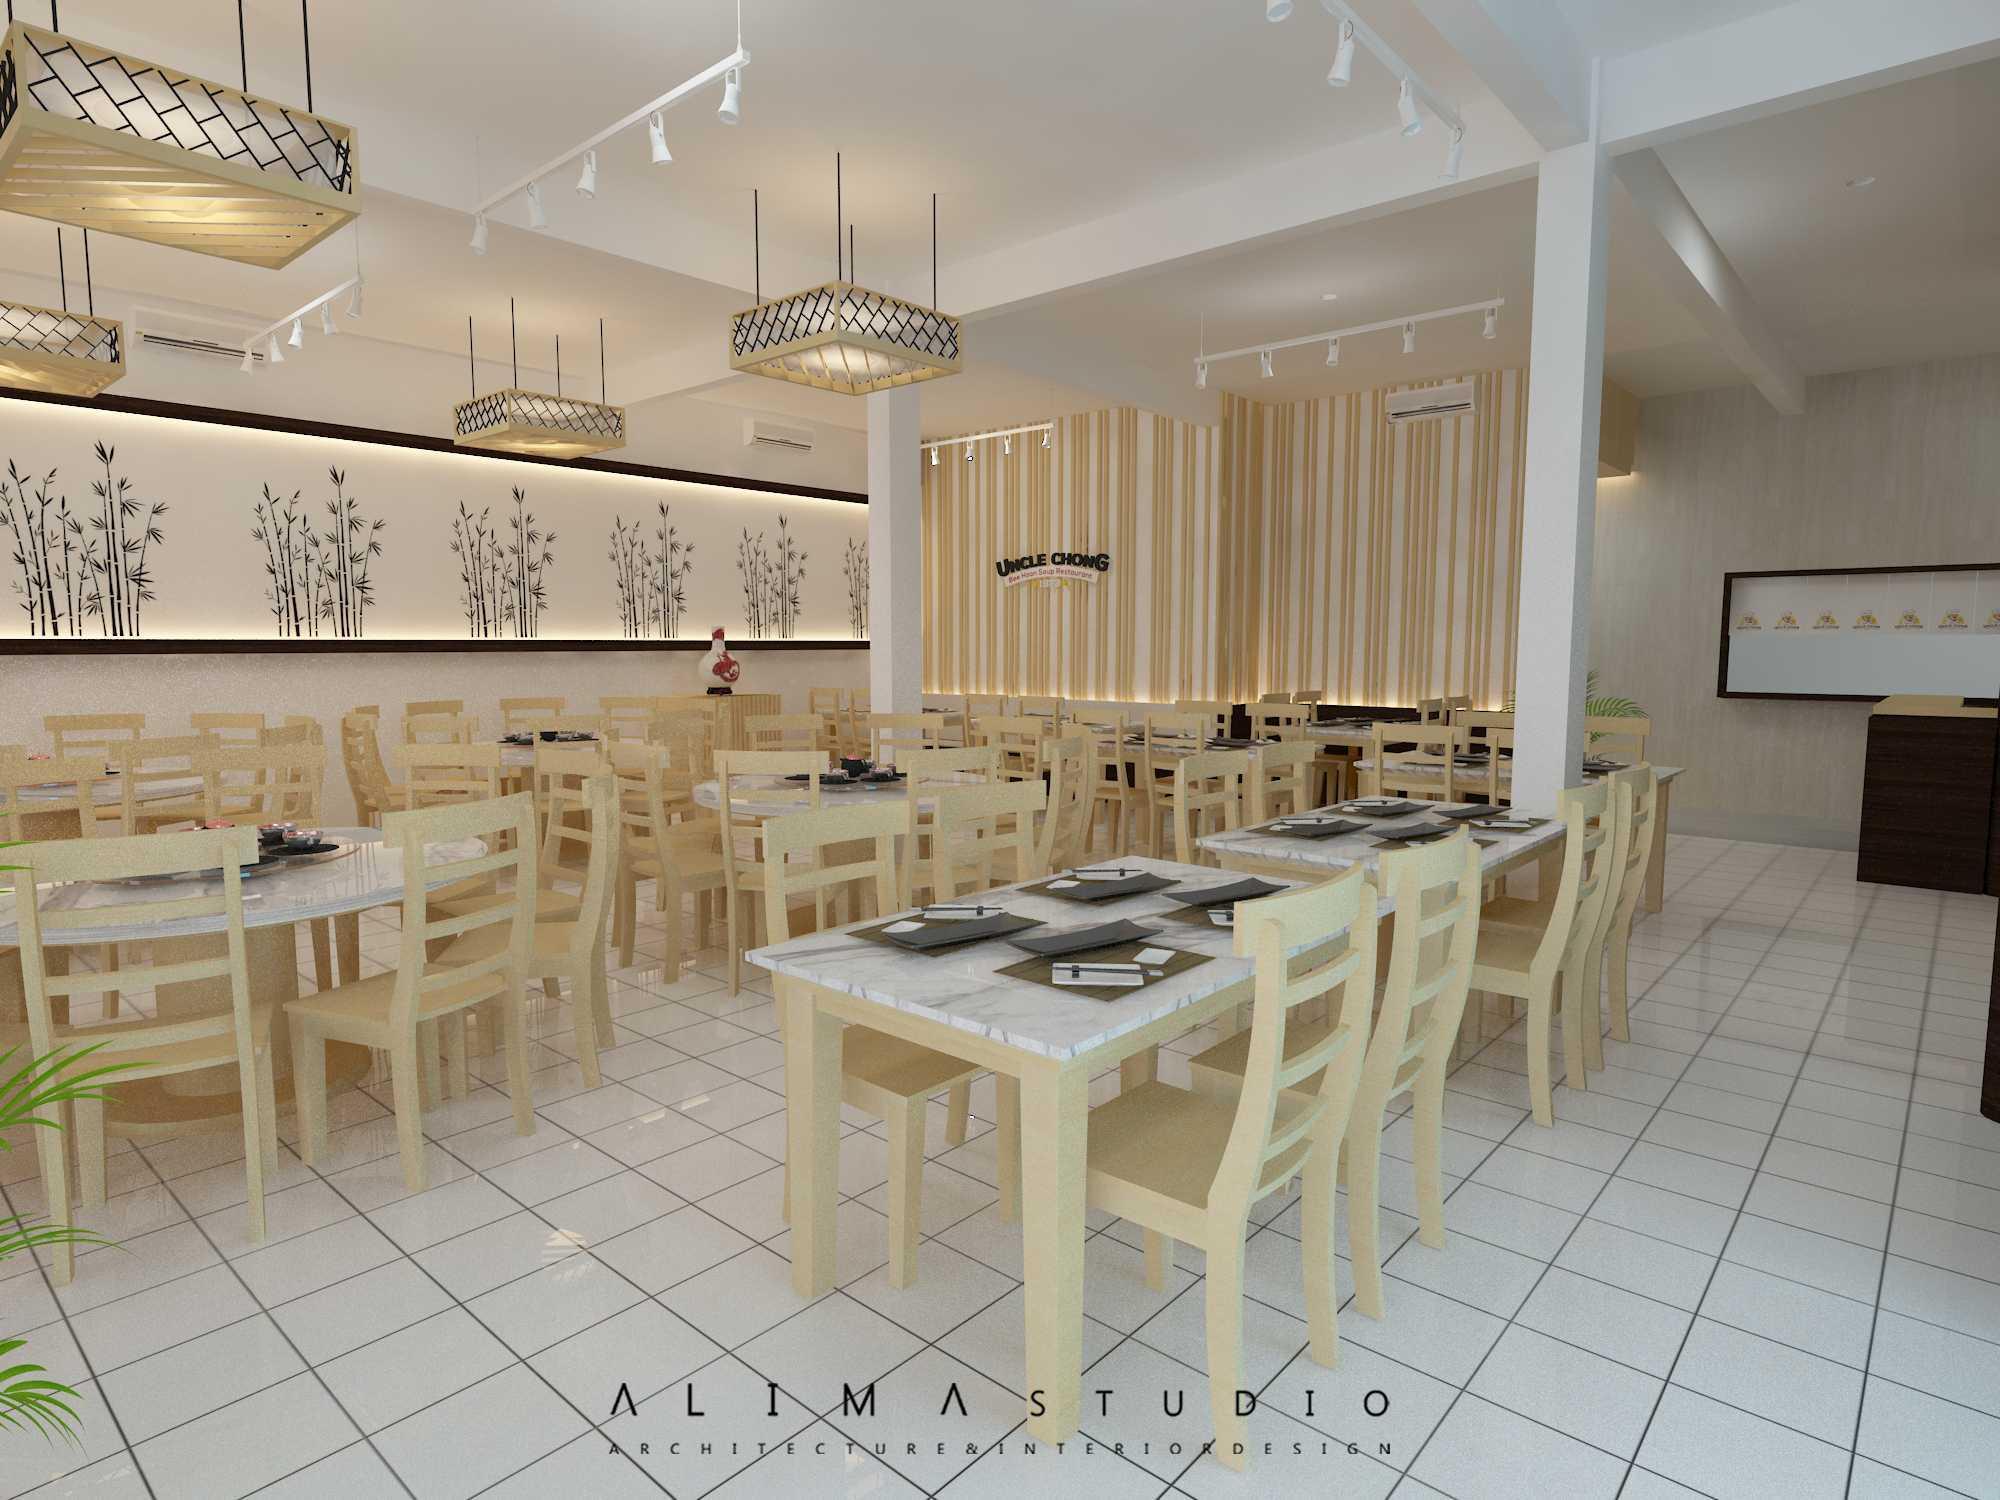 Alima Studio Uncle Chong Restaurant Jl. By Pass Ngurah Rai No.402, Sanur, Denpasar Sel., Bali, 80228, Indonesia Jl. By Pass Ngurah Rai No.402, Sanur, Denpasar Sel., Bali, 80228, Indonesia Alima-Studio-Uncle-Chong-Restaurant   61862